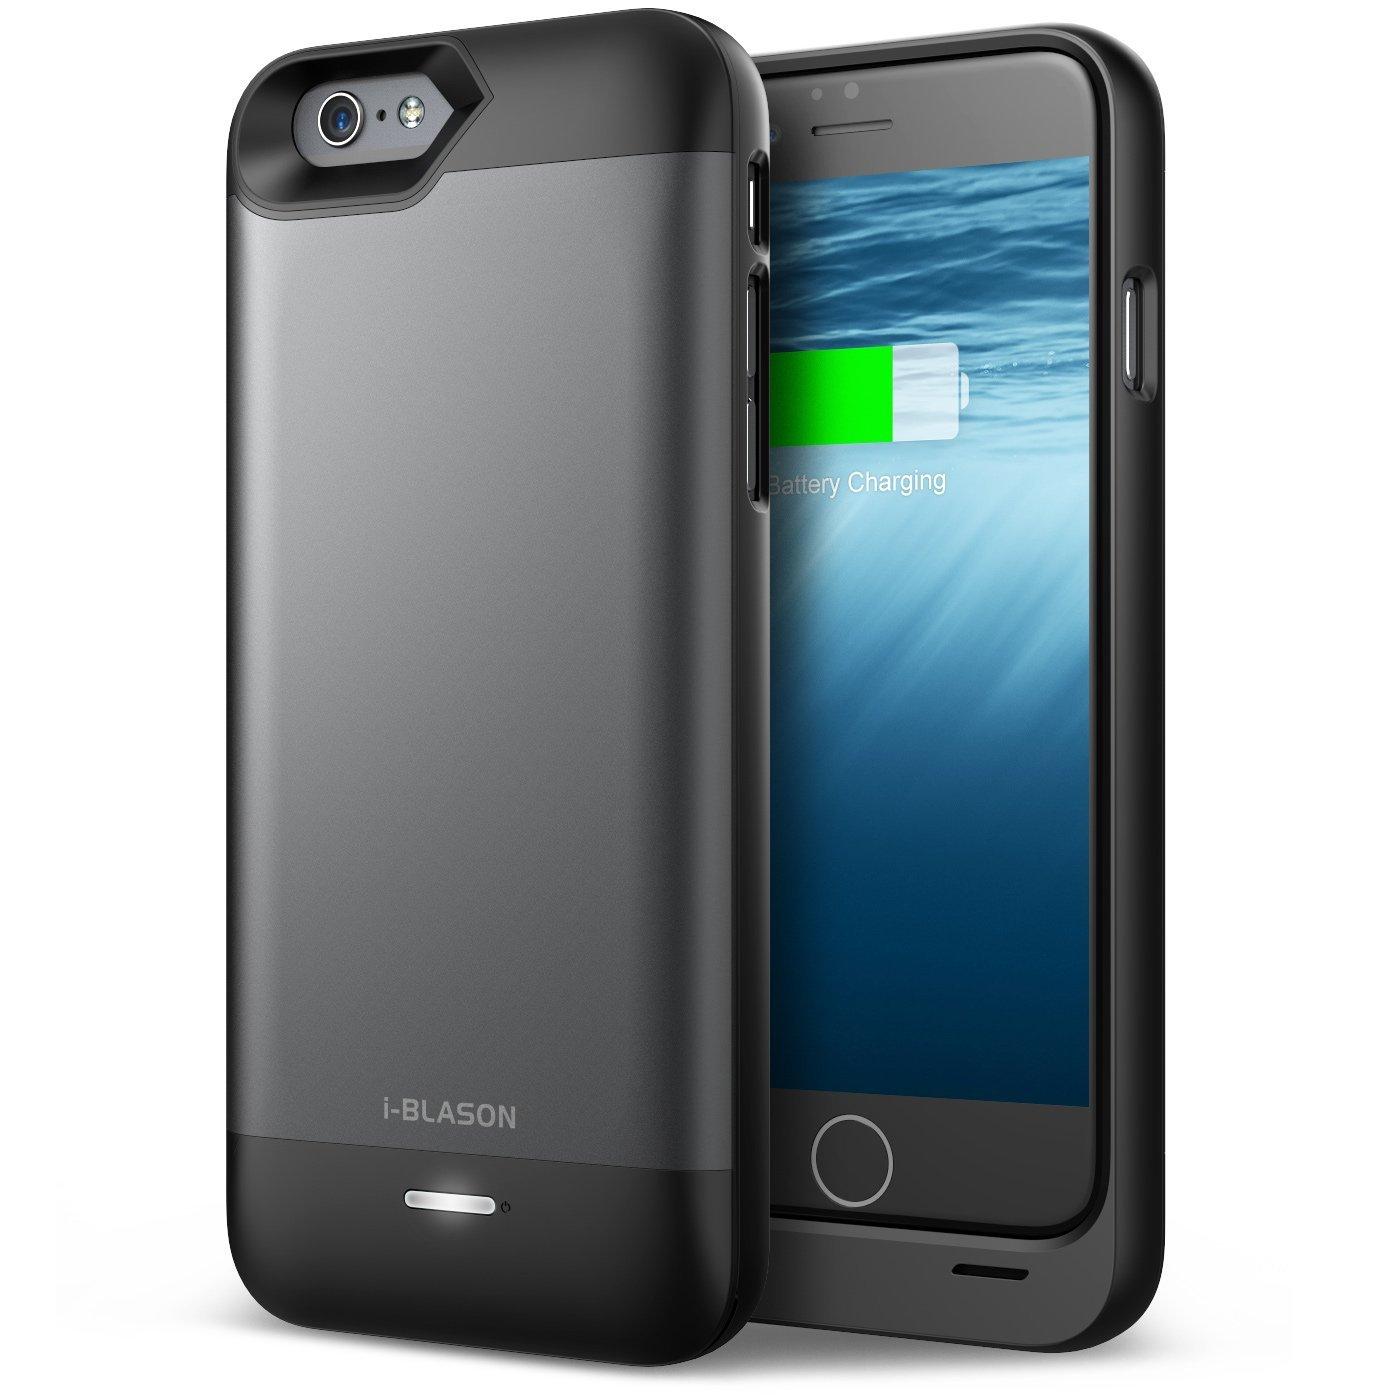 i-Blason UnityPower iPhone 6 case